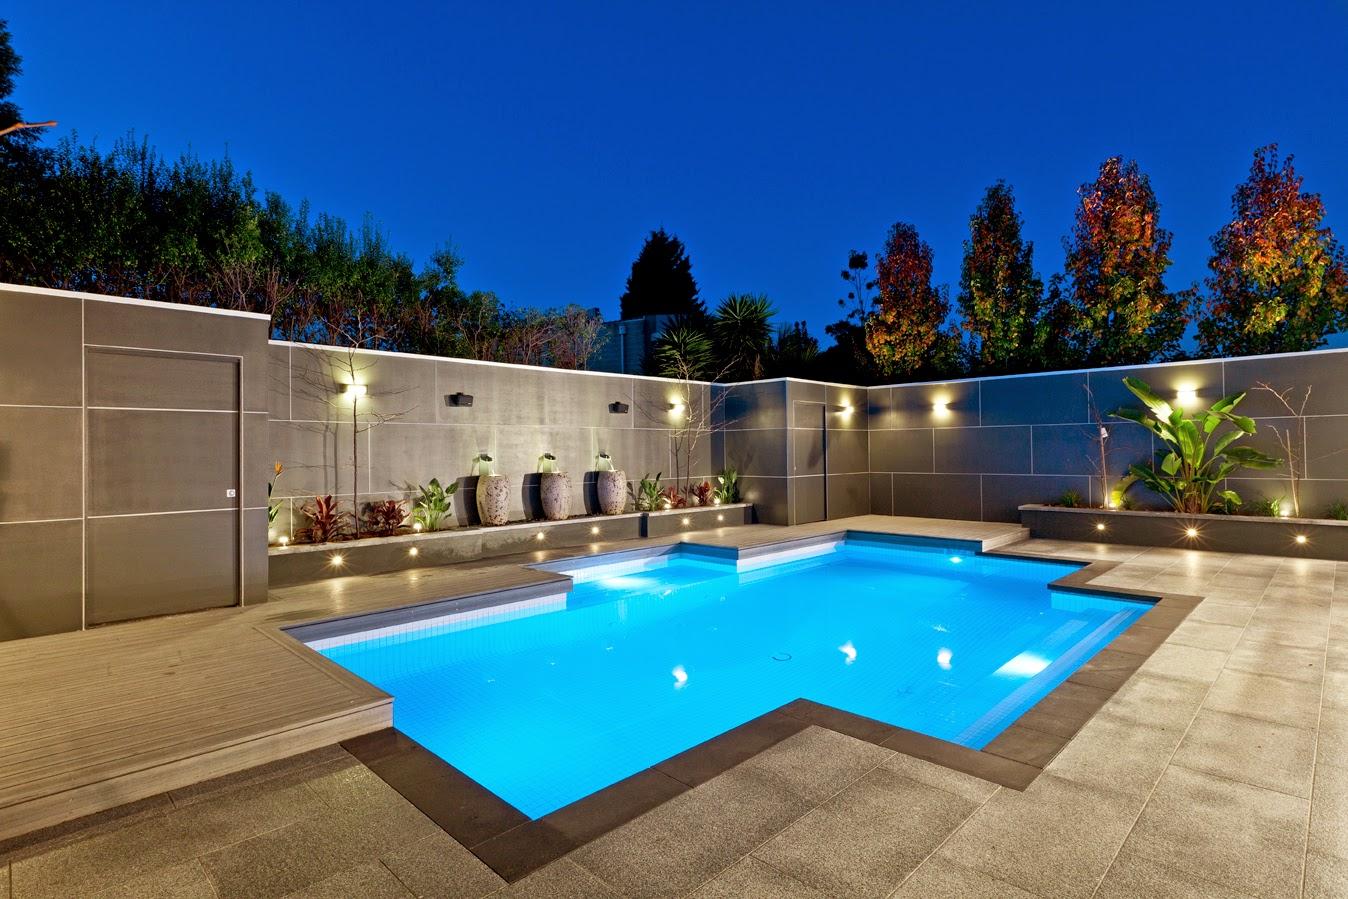 Cocab pools piscinas de alvenaria for Piscinas pool